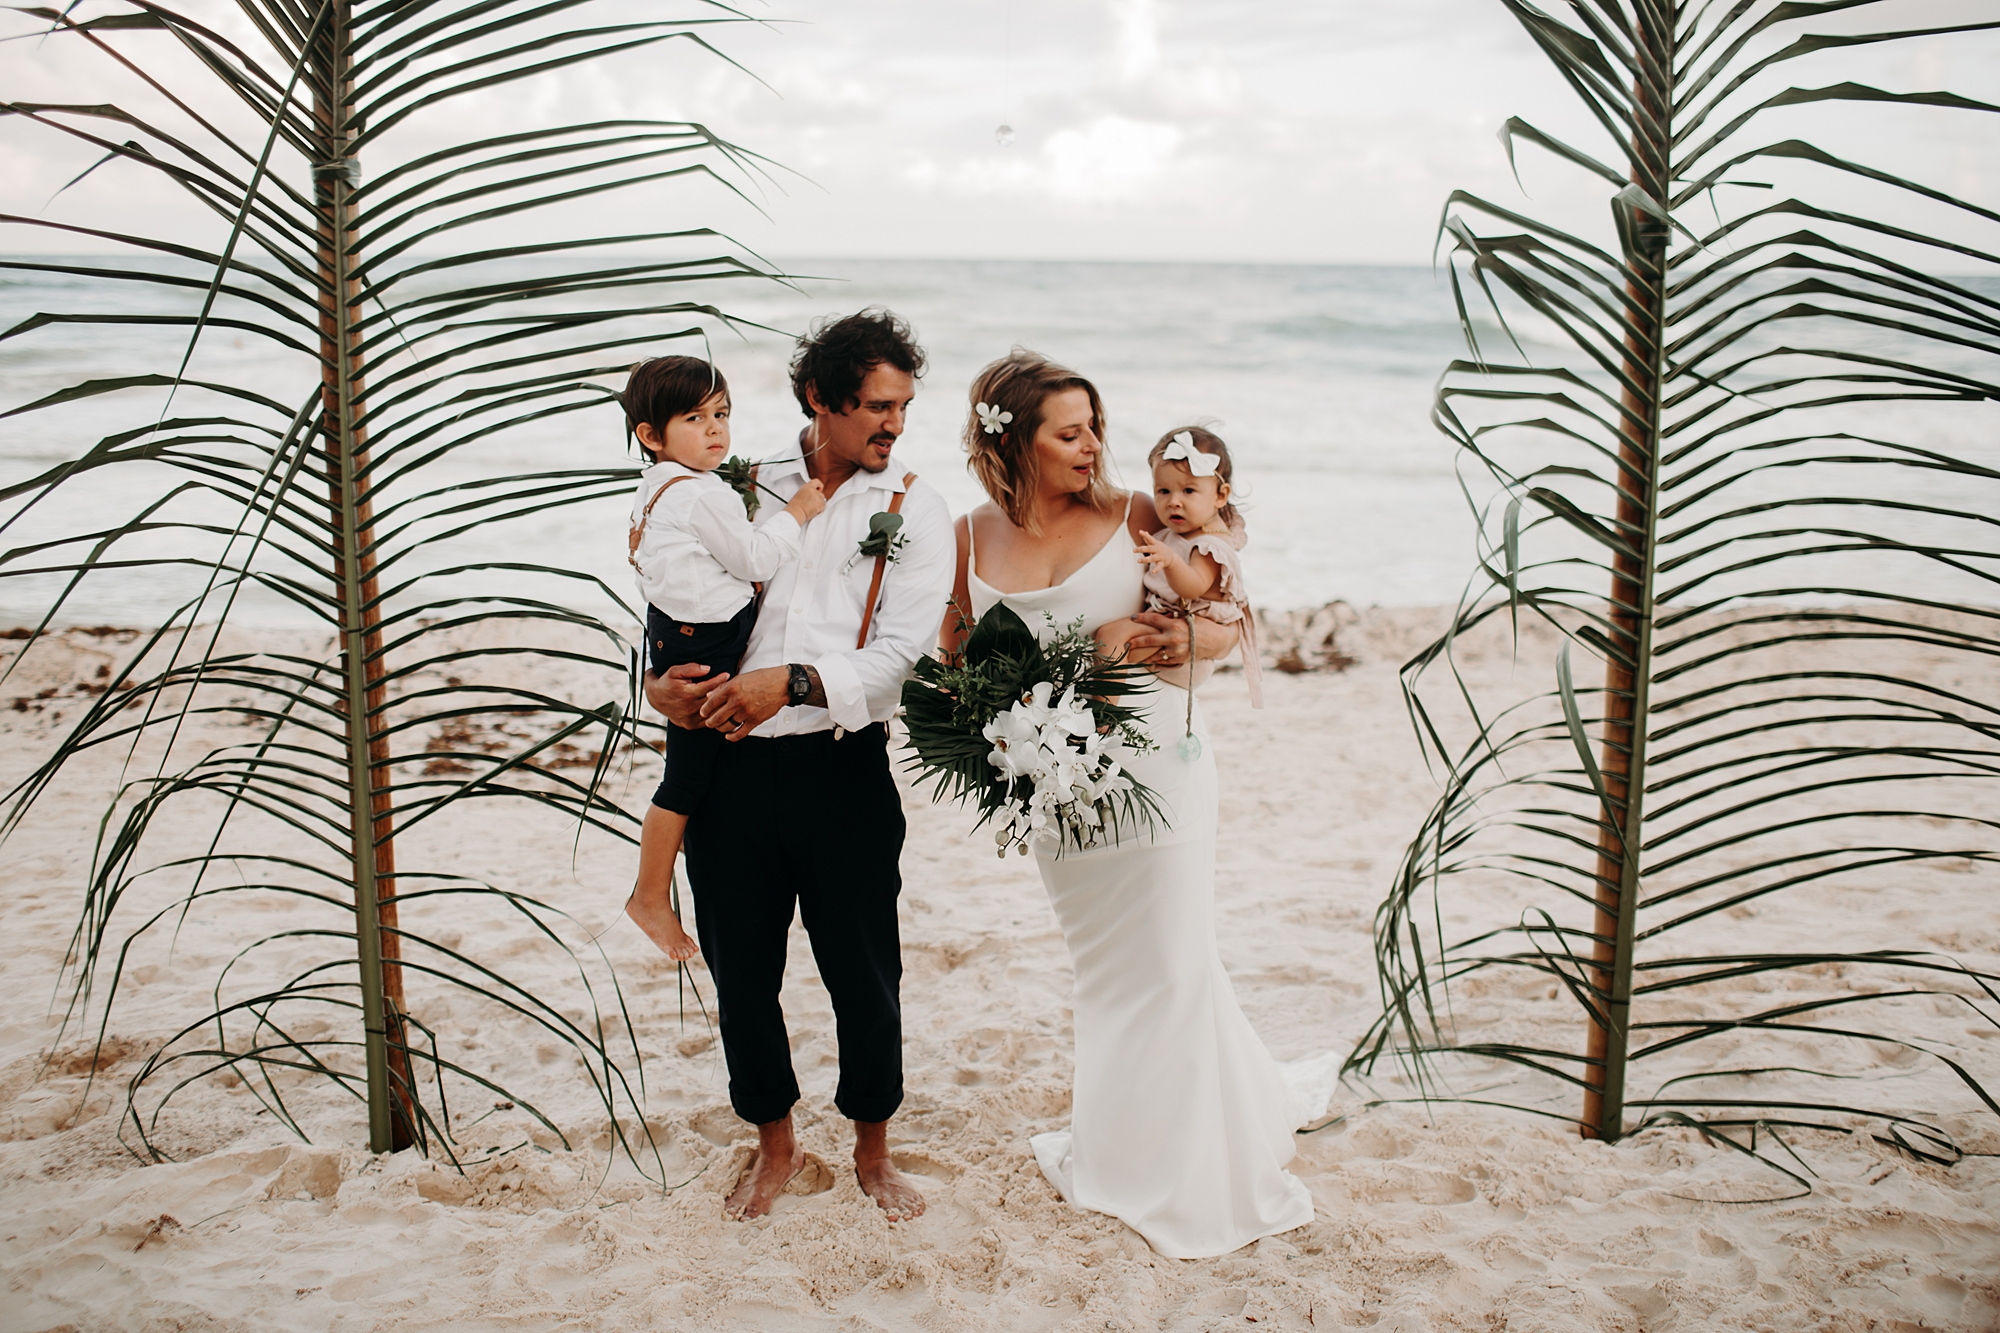 Danielle-San-Antonio-Wedding-Photographer-202_WEB.jpg